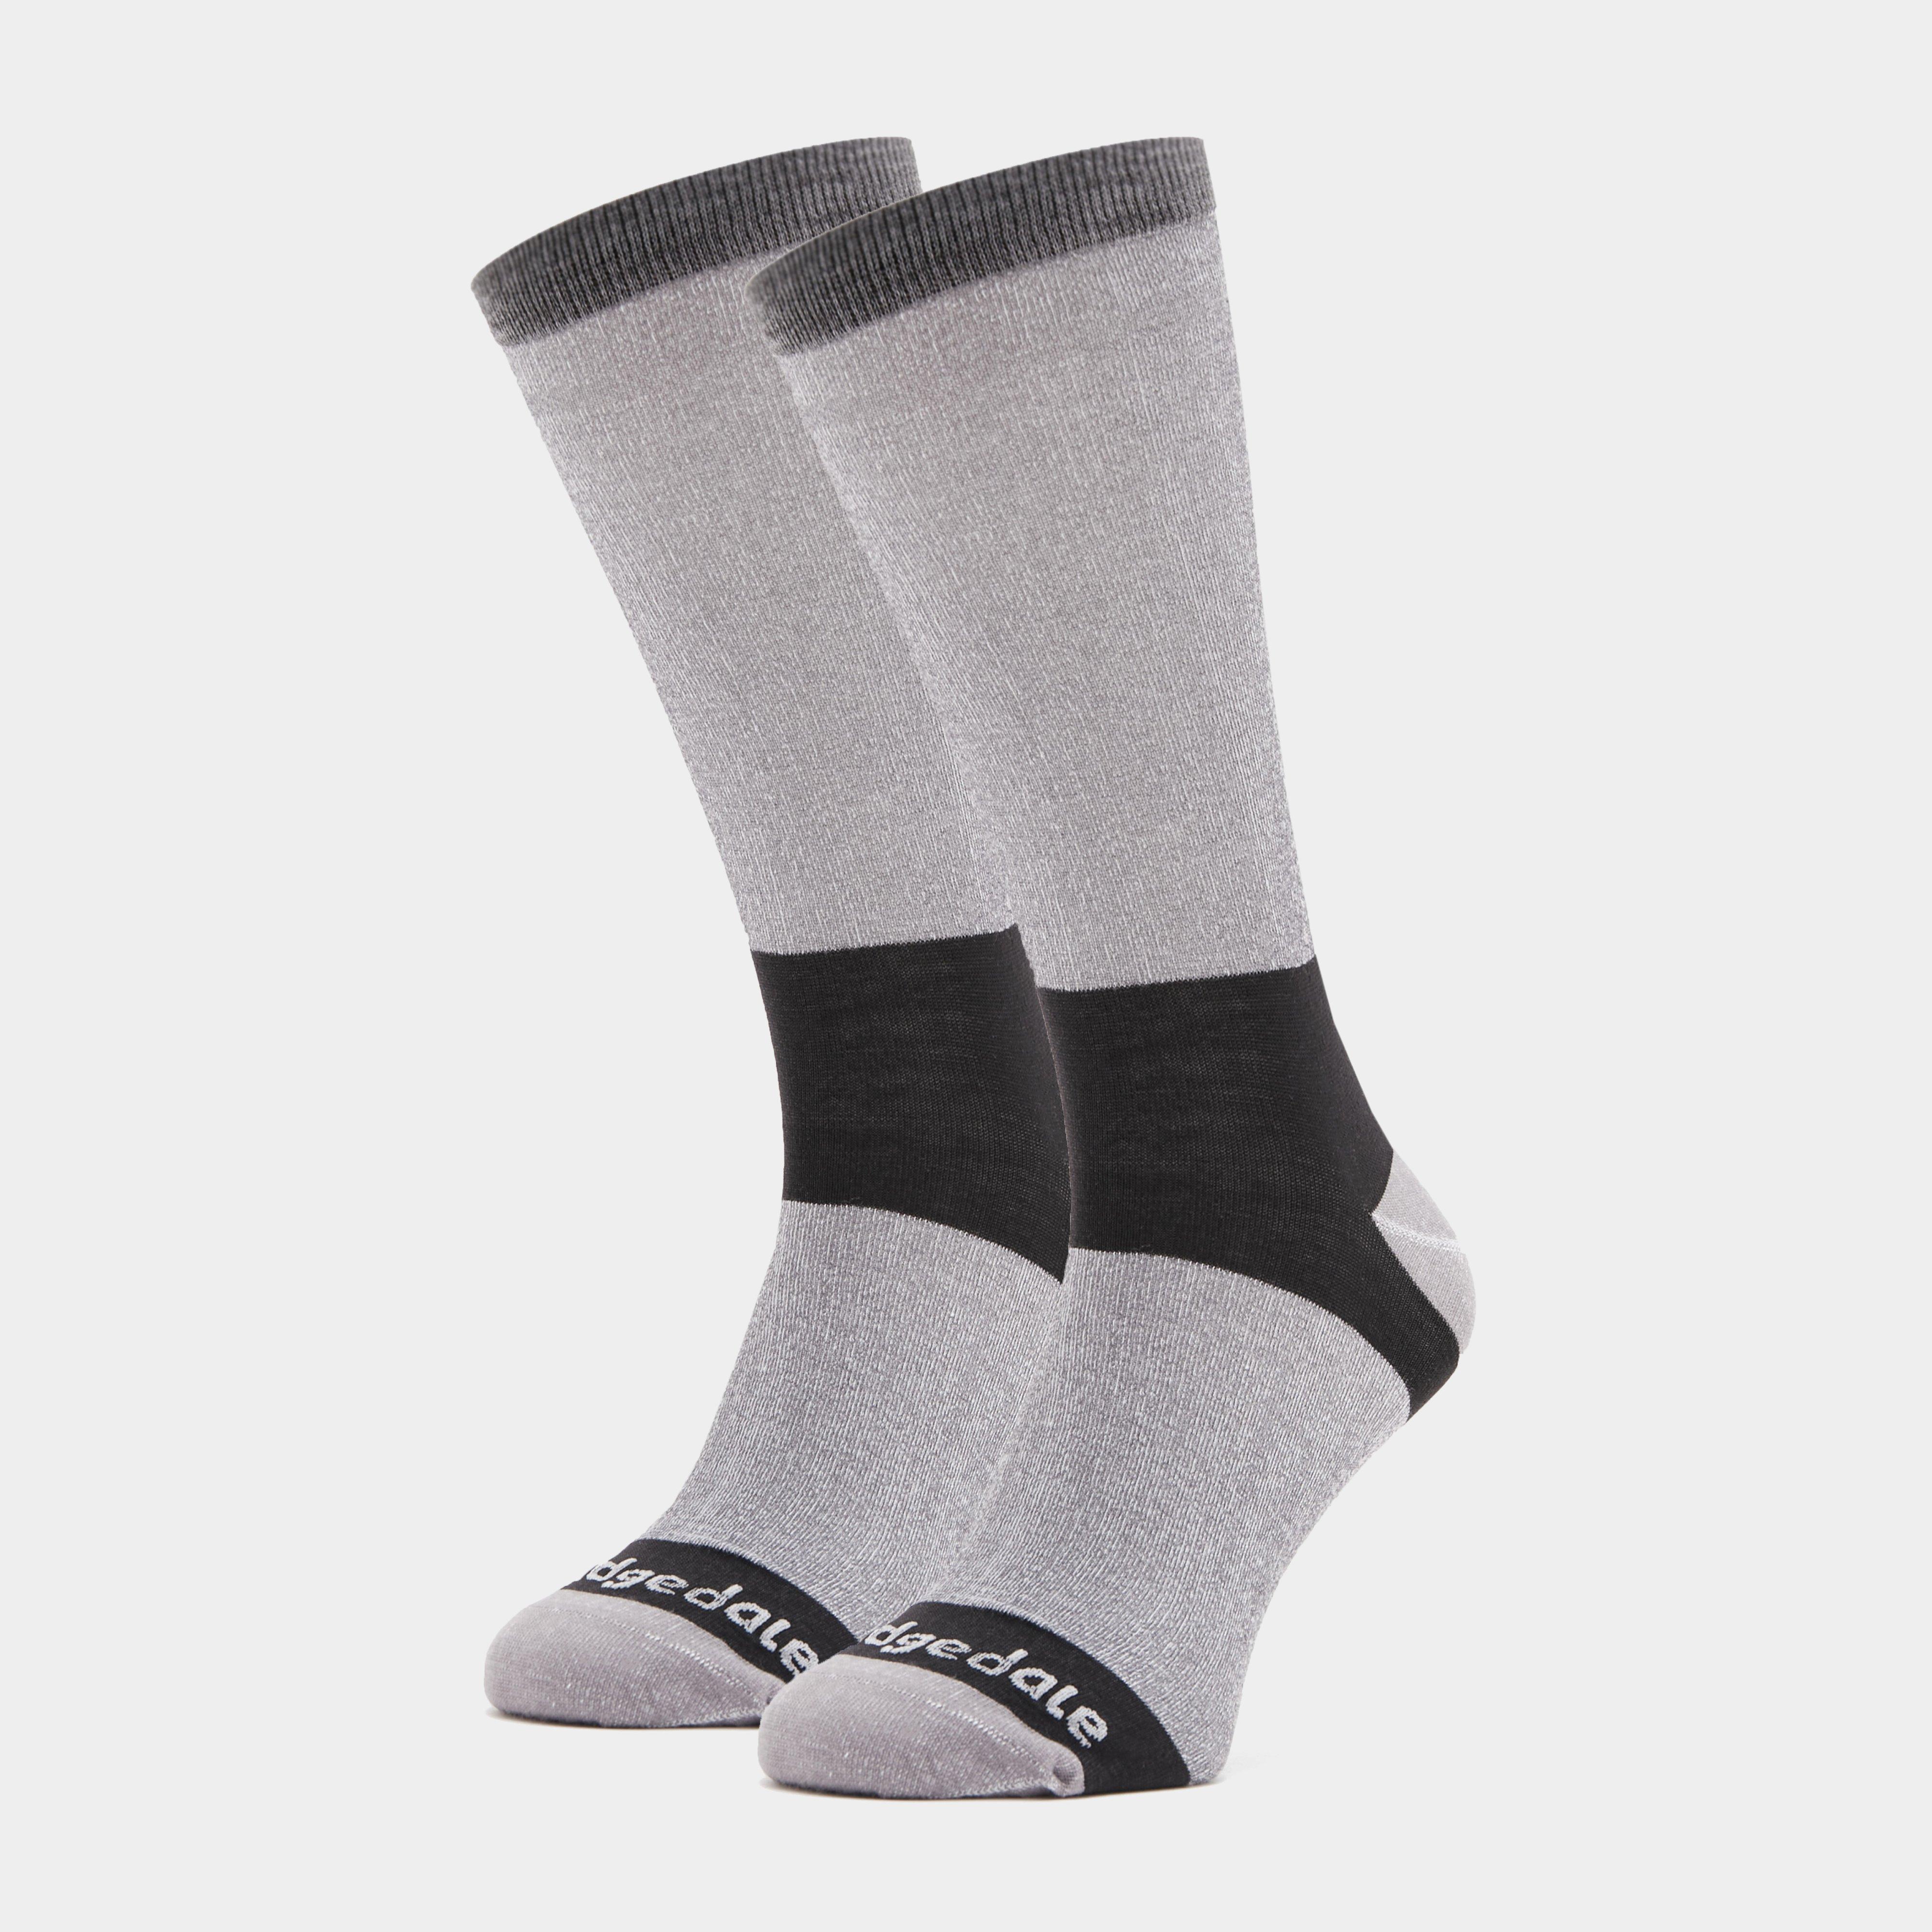 Bridgedale Bridgedale Mens Base Layer Coolmax Liner Boot Socks (2 Pair) - Grey, Grey